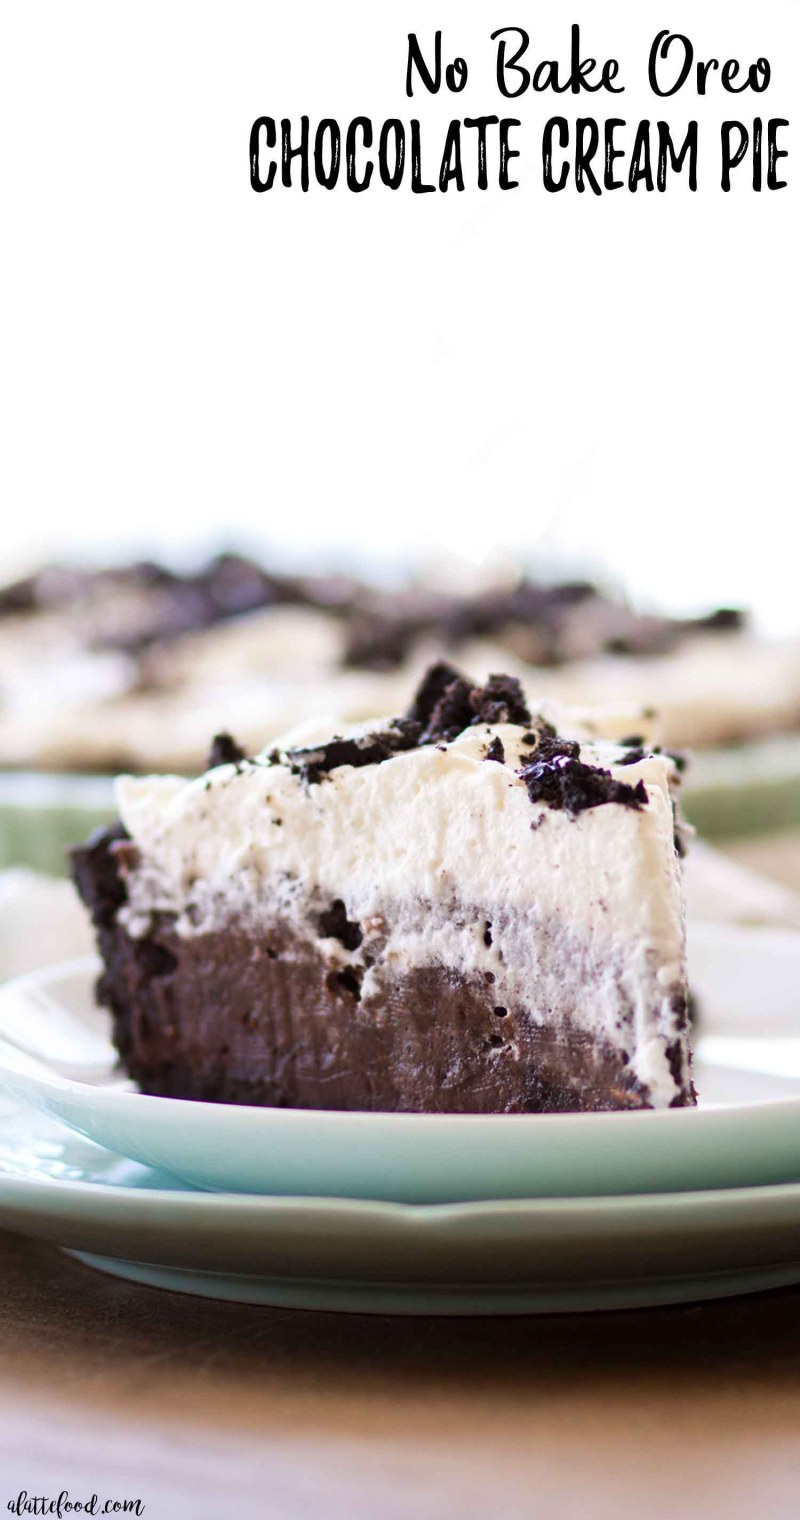 slice of no bake oreo chocolate cream pie with text